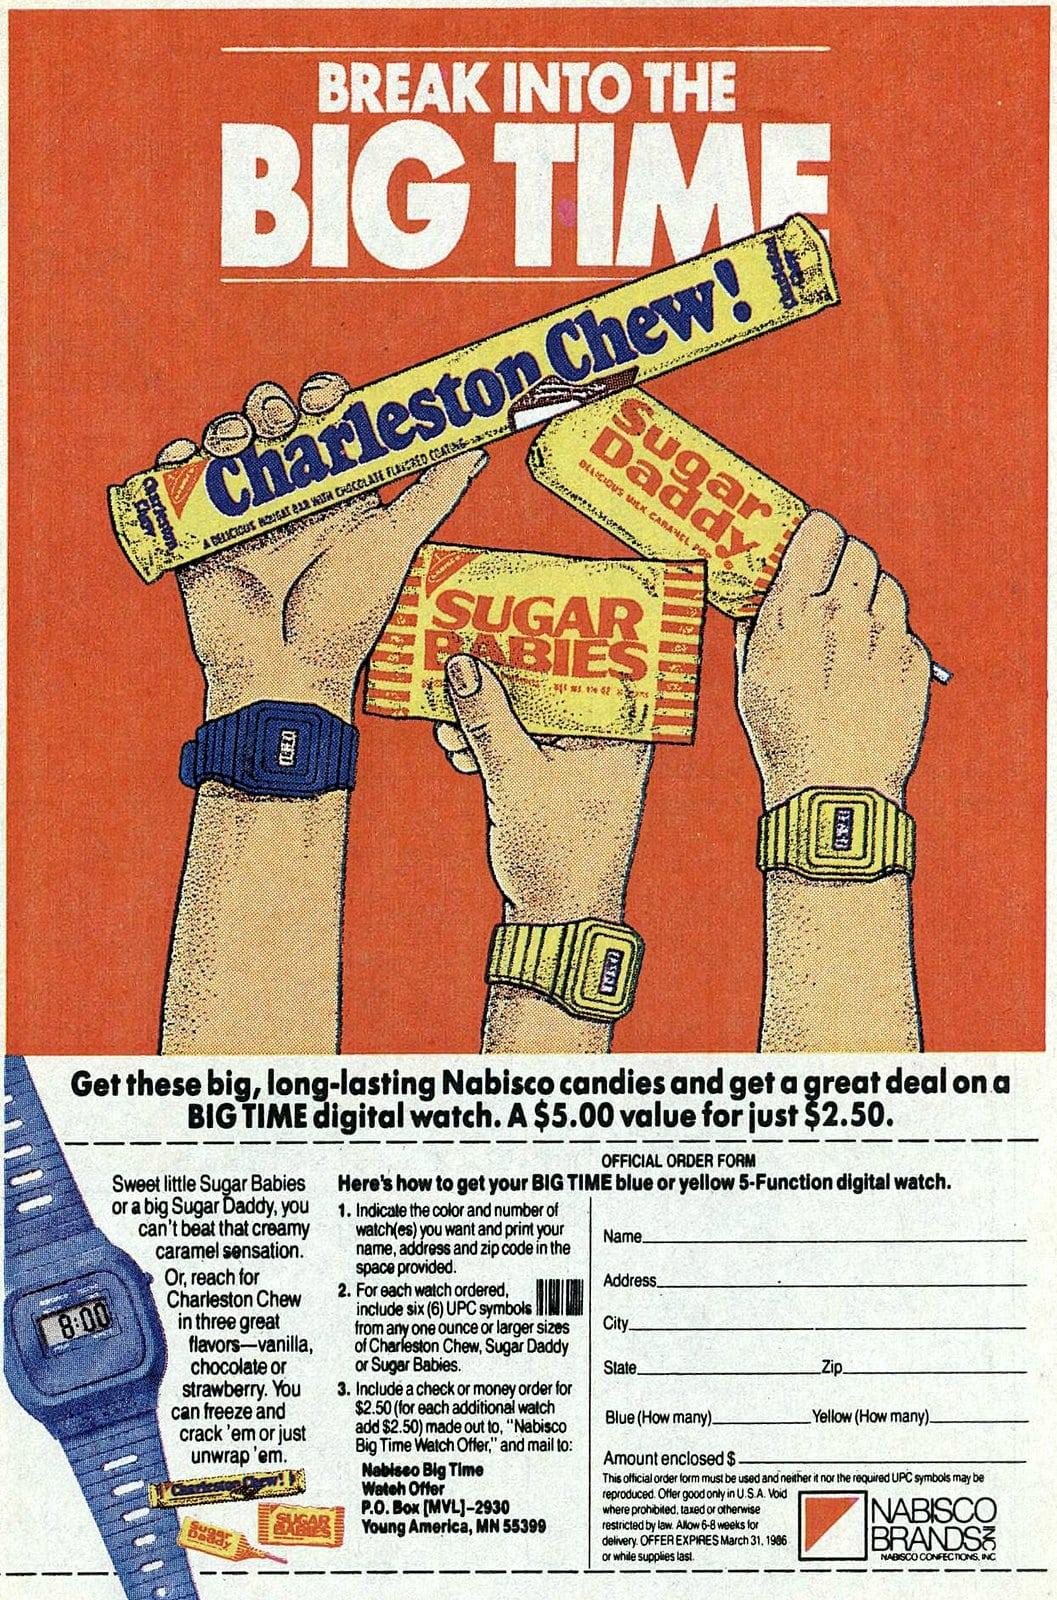 Retro 1980s Sugar Babies Sugar Daddy and Charleston Chew candies (1986)